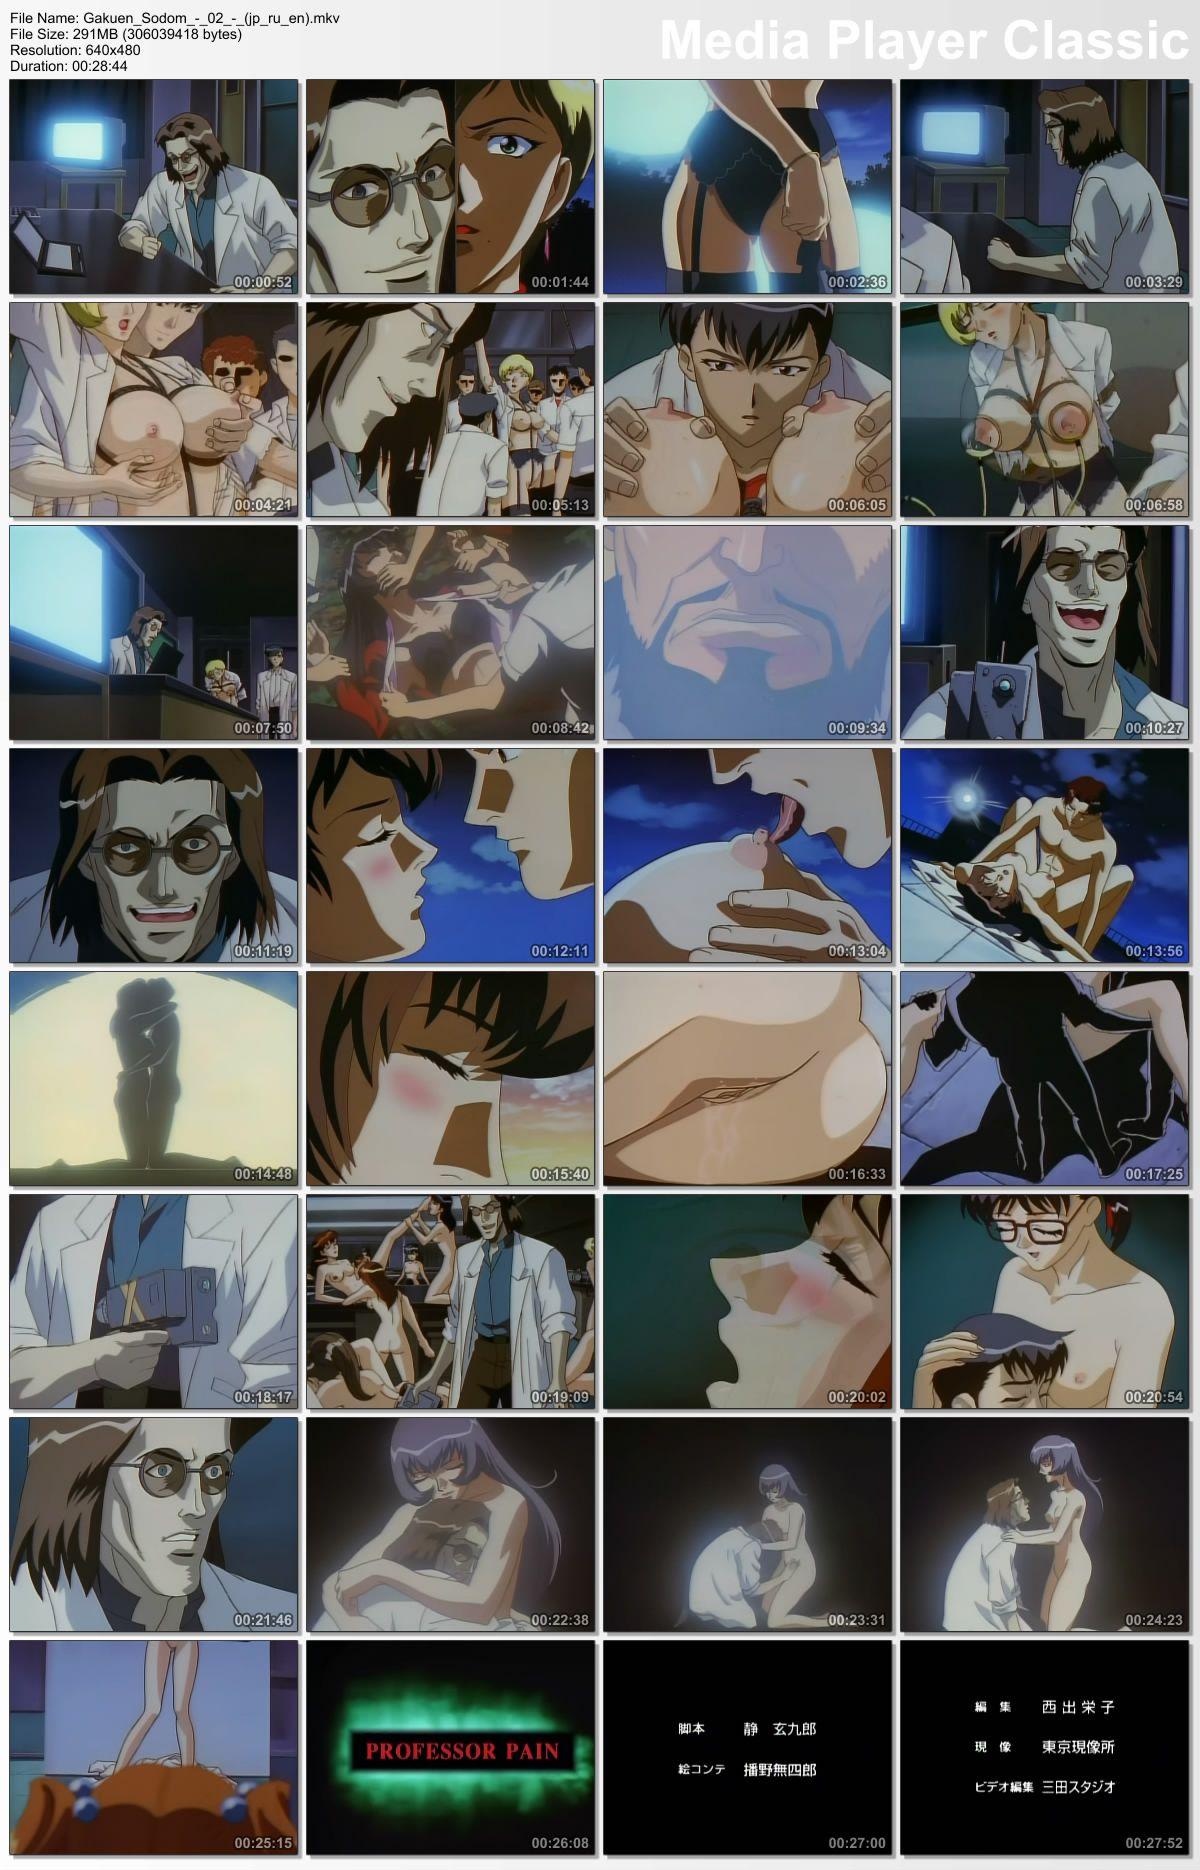 Professor Pain / Gakuen Sodom / Профессор Боль [2 из 2] [RUS;JAP;ENG] Anime Hentai